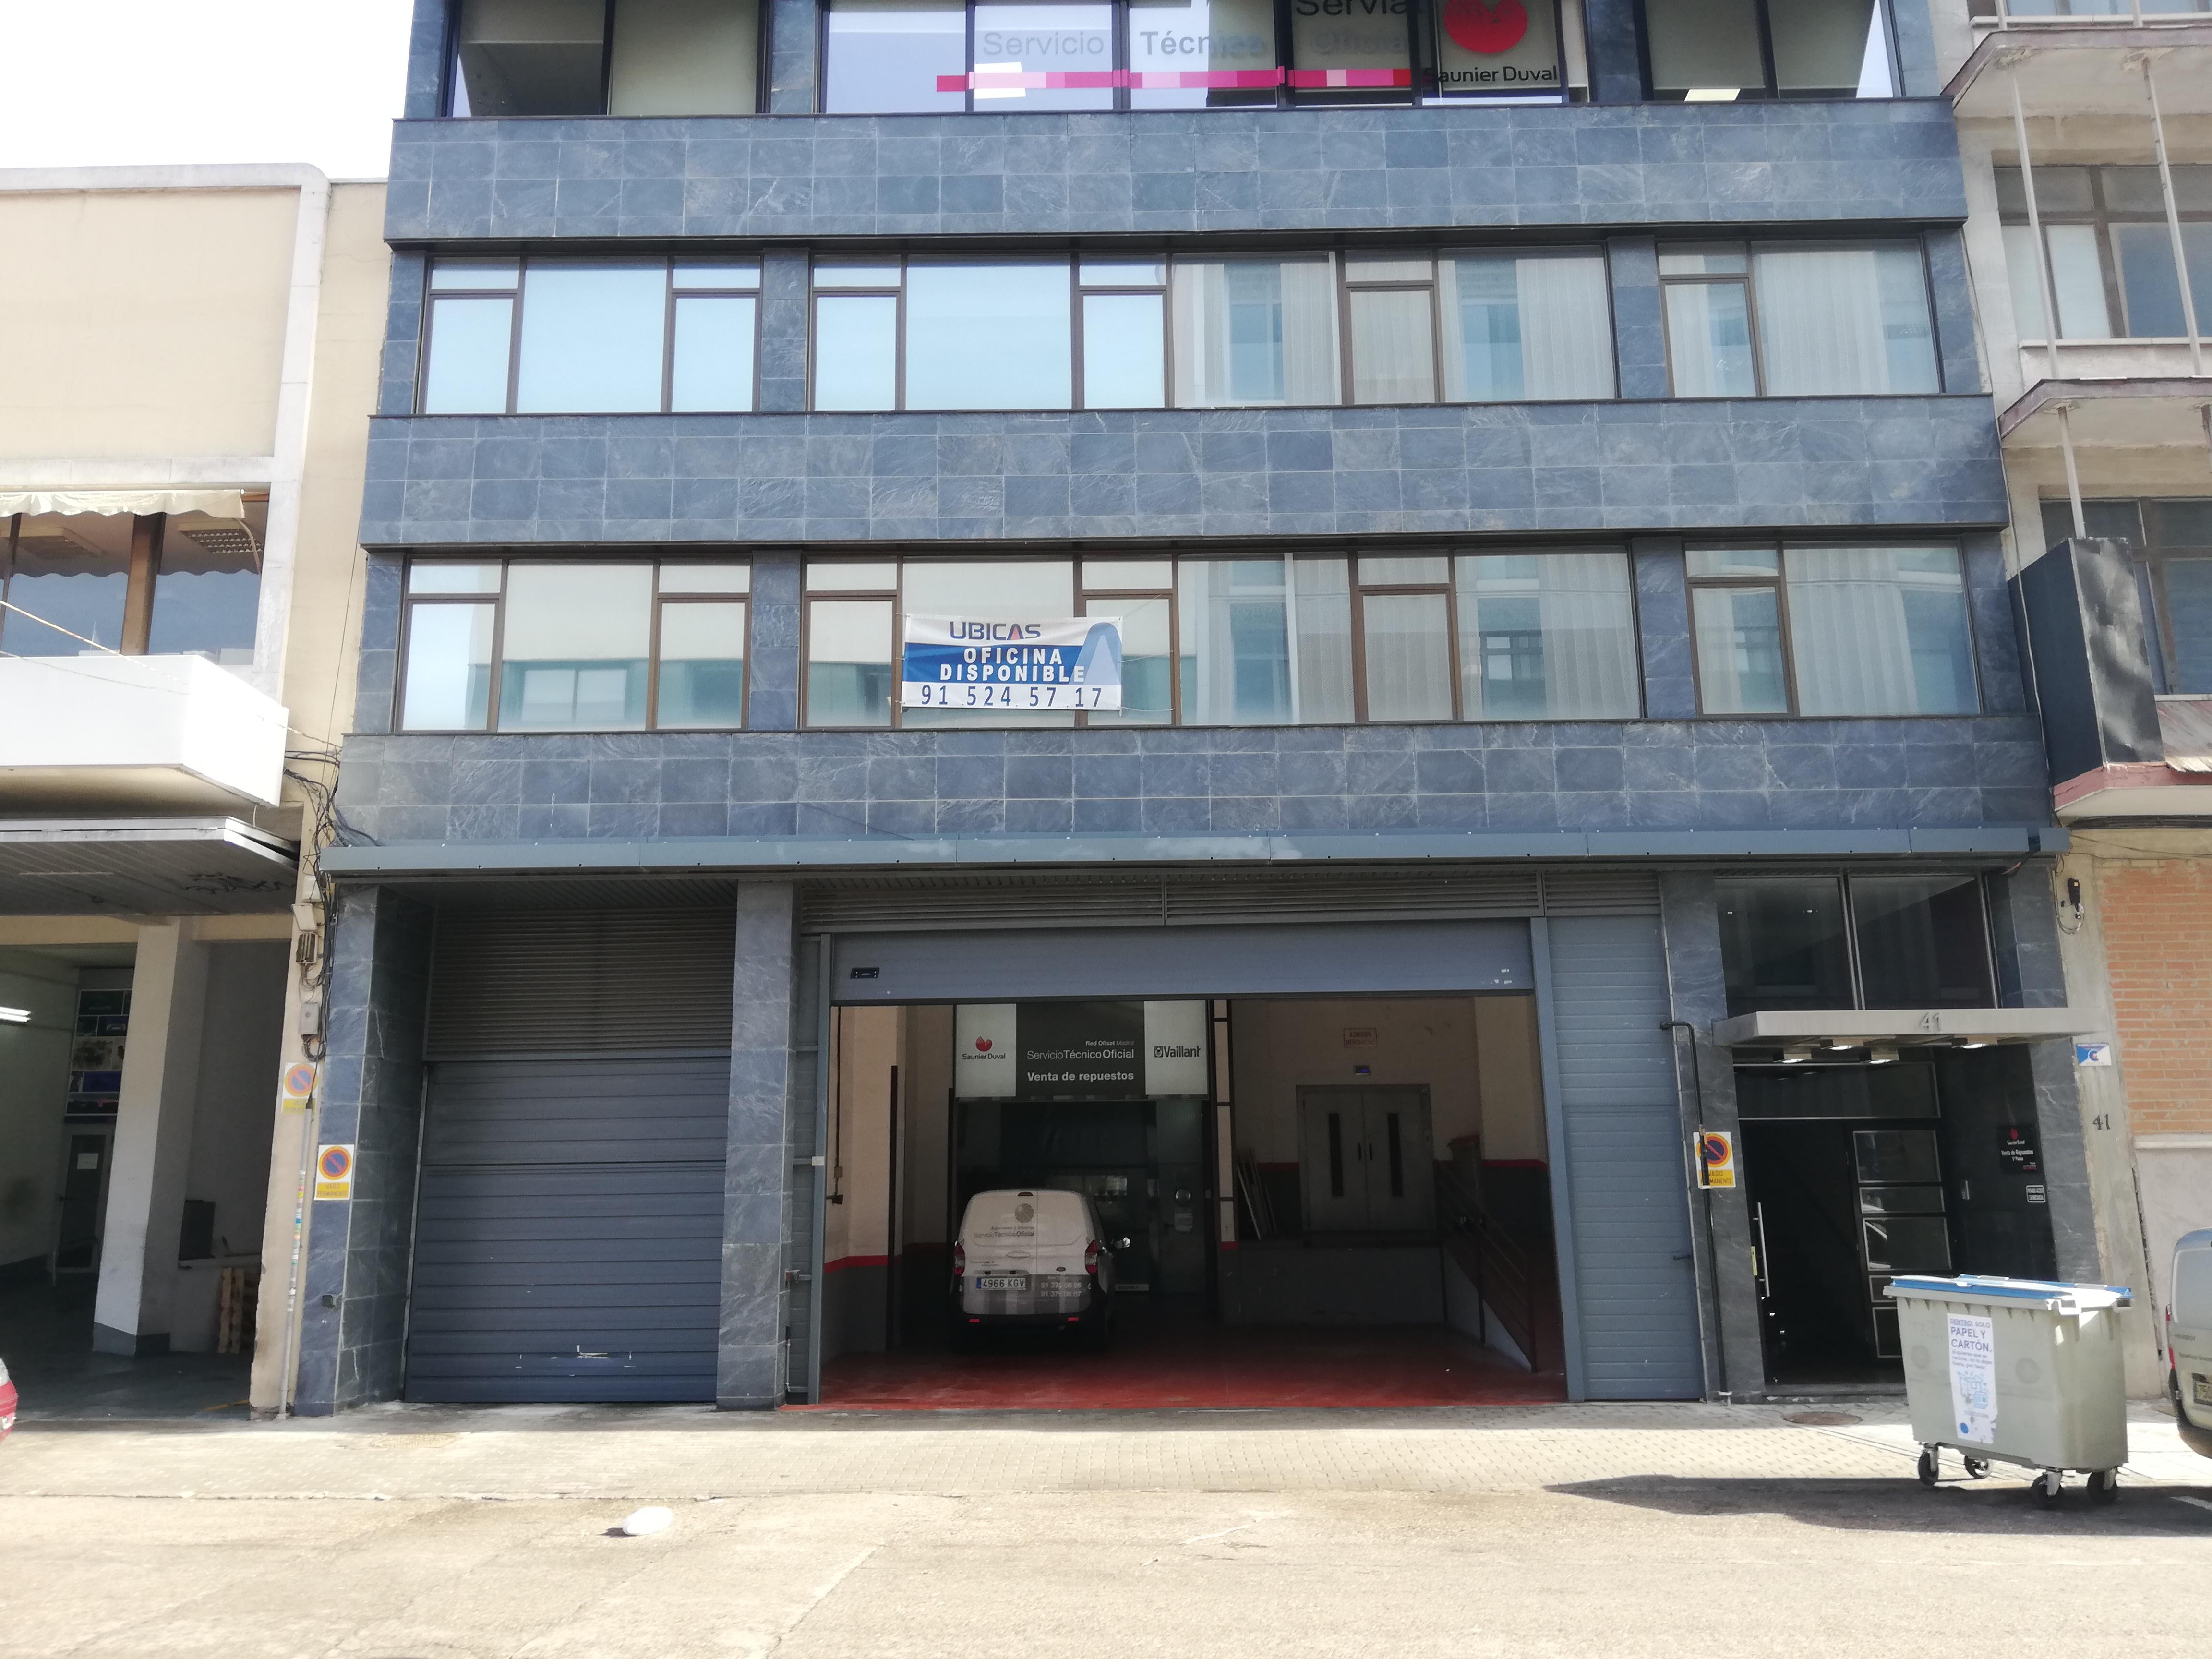 Servicio Técnico Oficial Saunier Duval, Ofisat Madrid